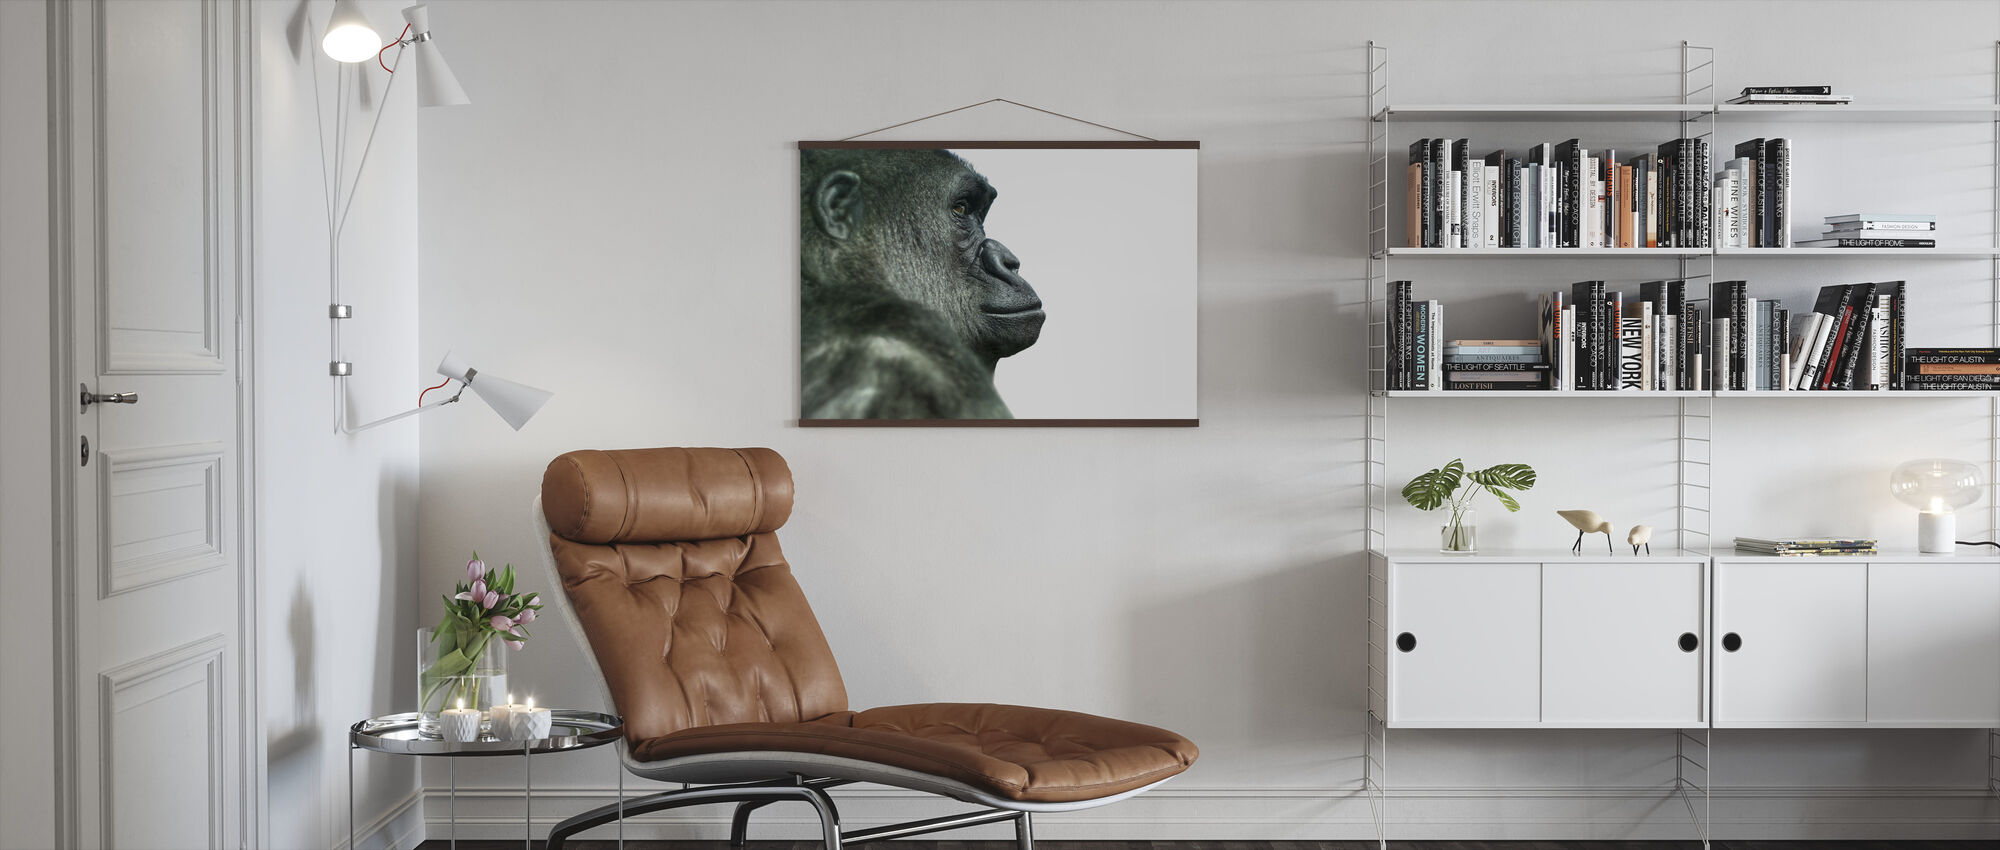 Gorilla - Poster - Living Room